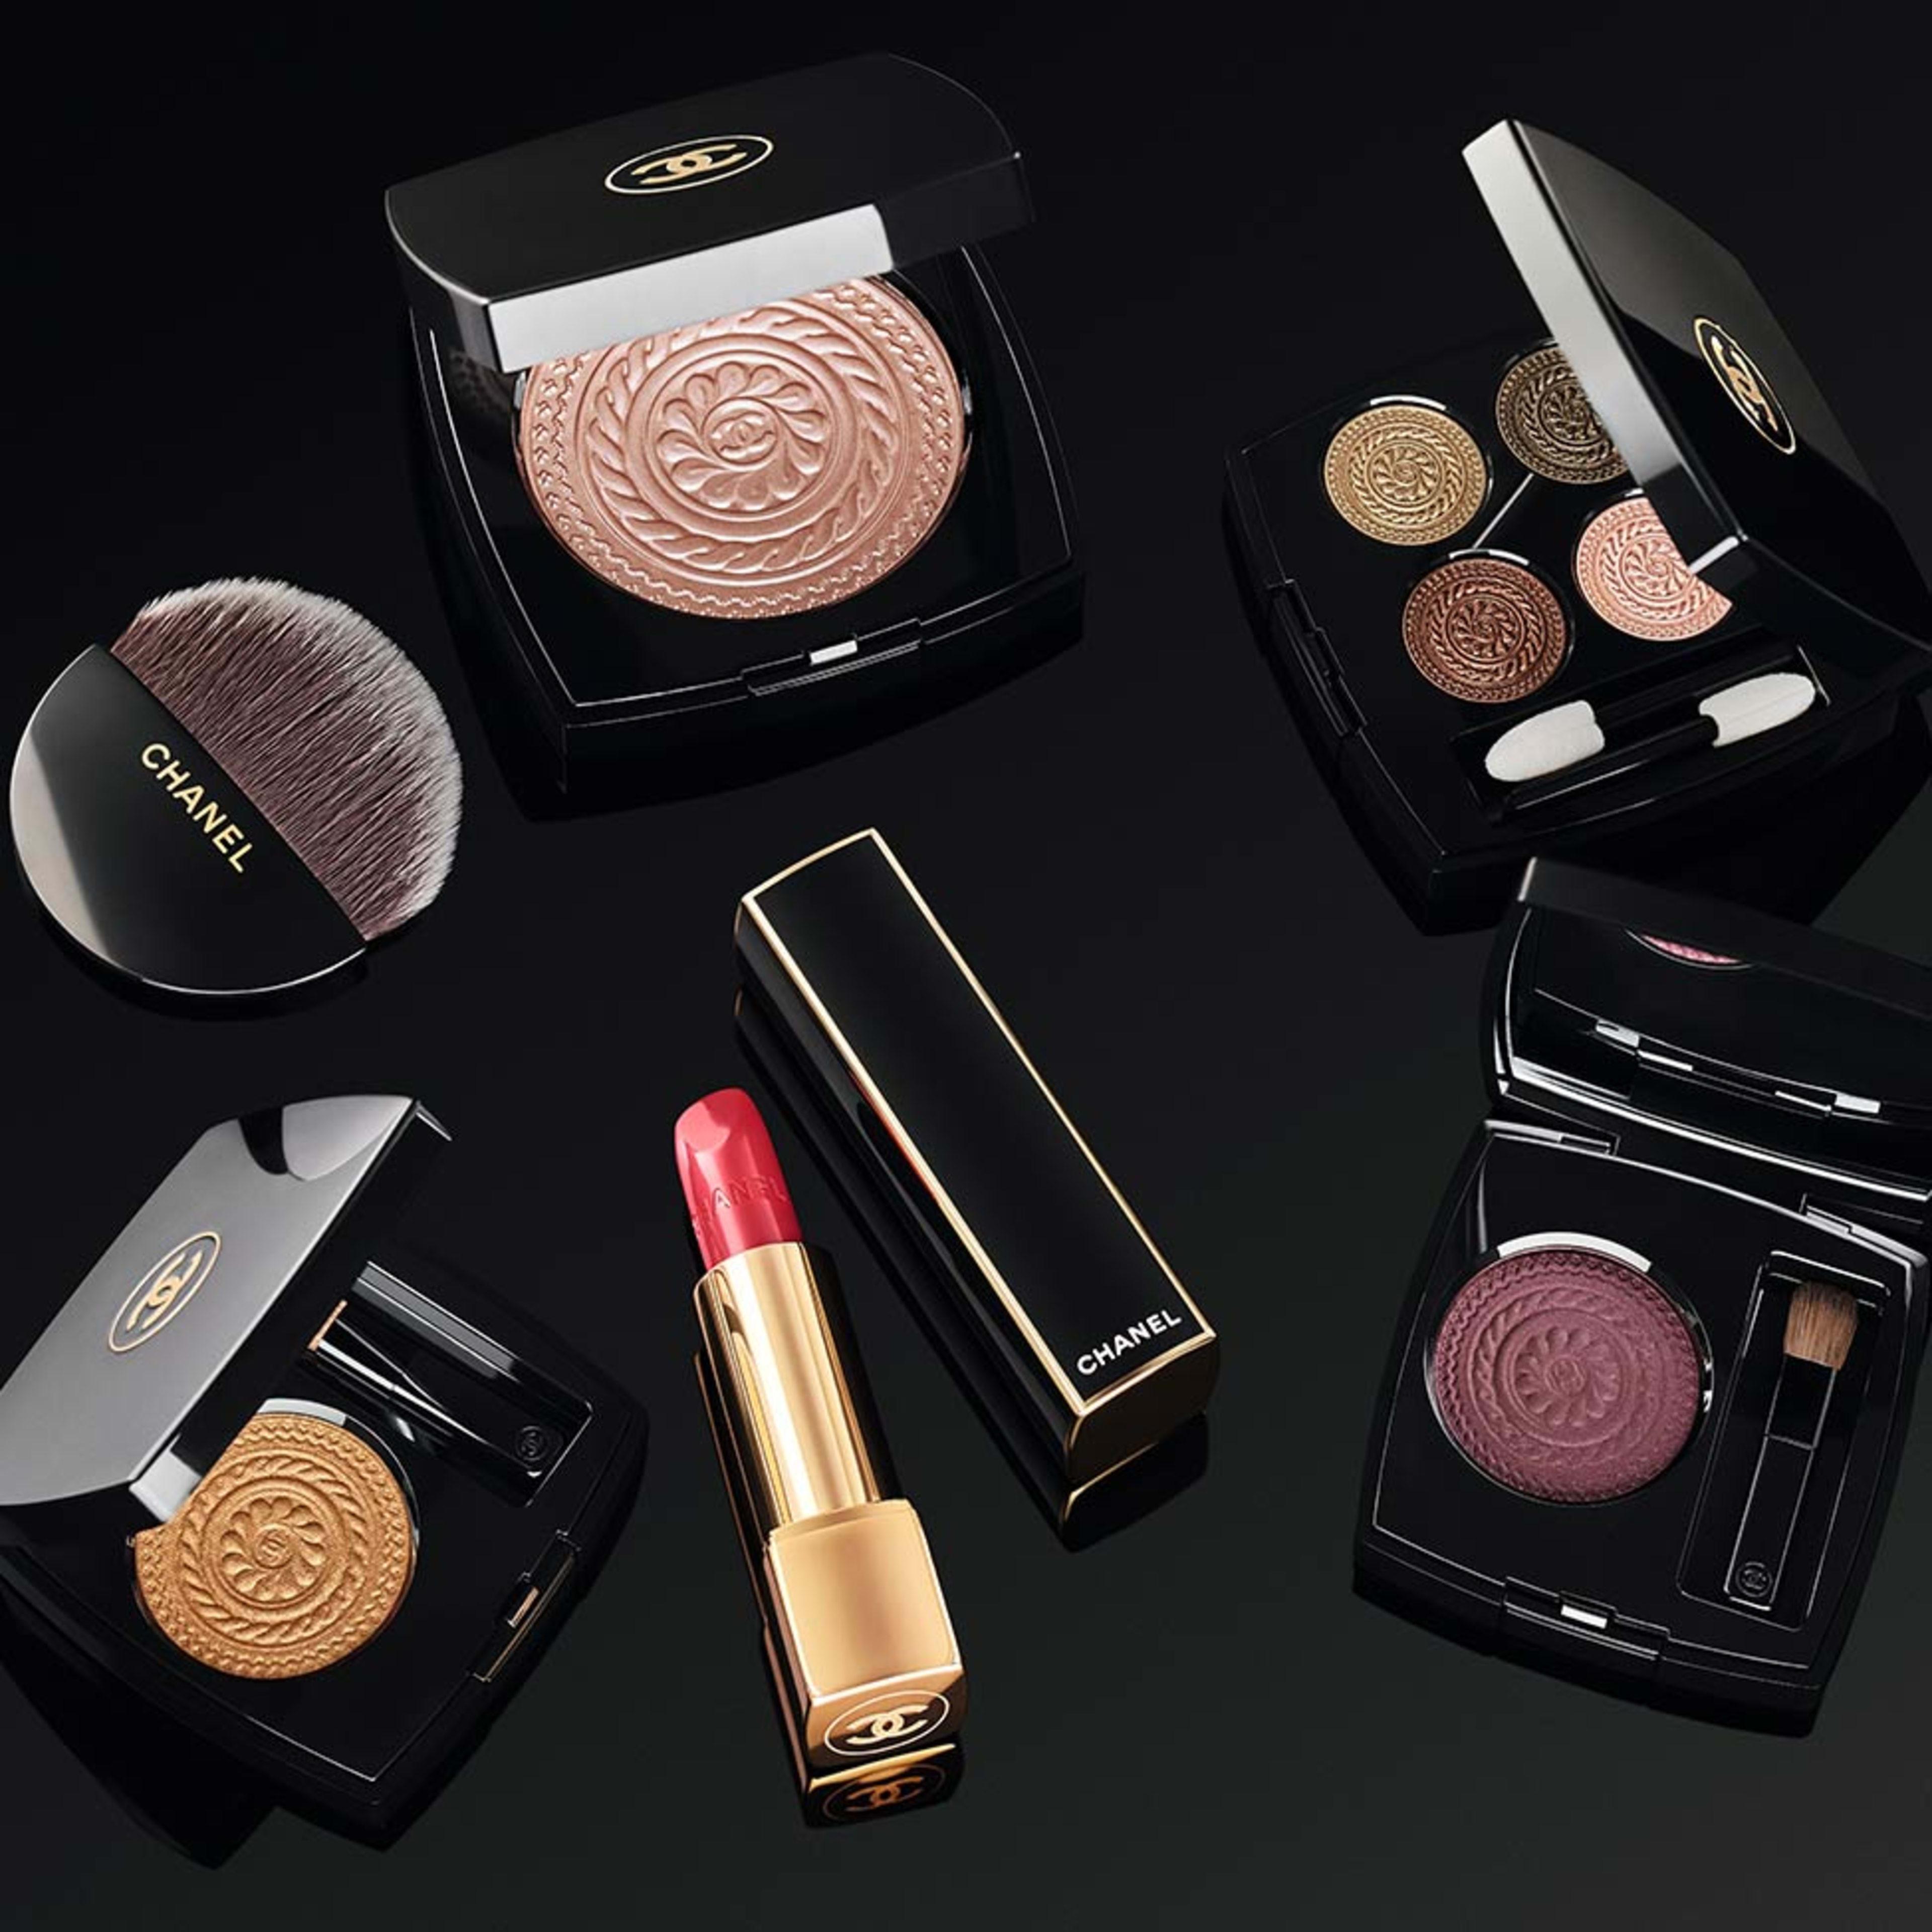 Chanel Holiday Makeup